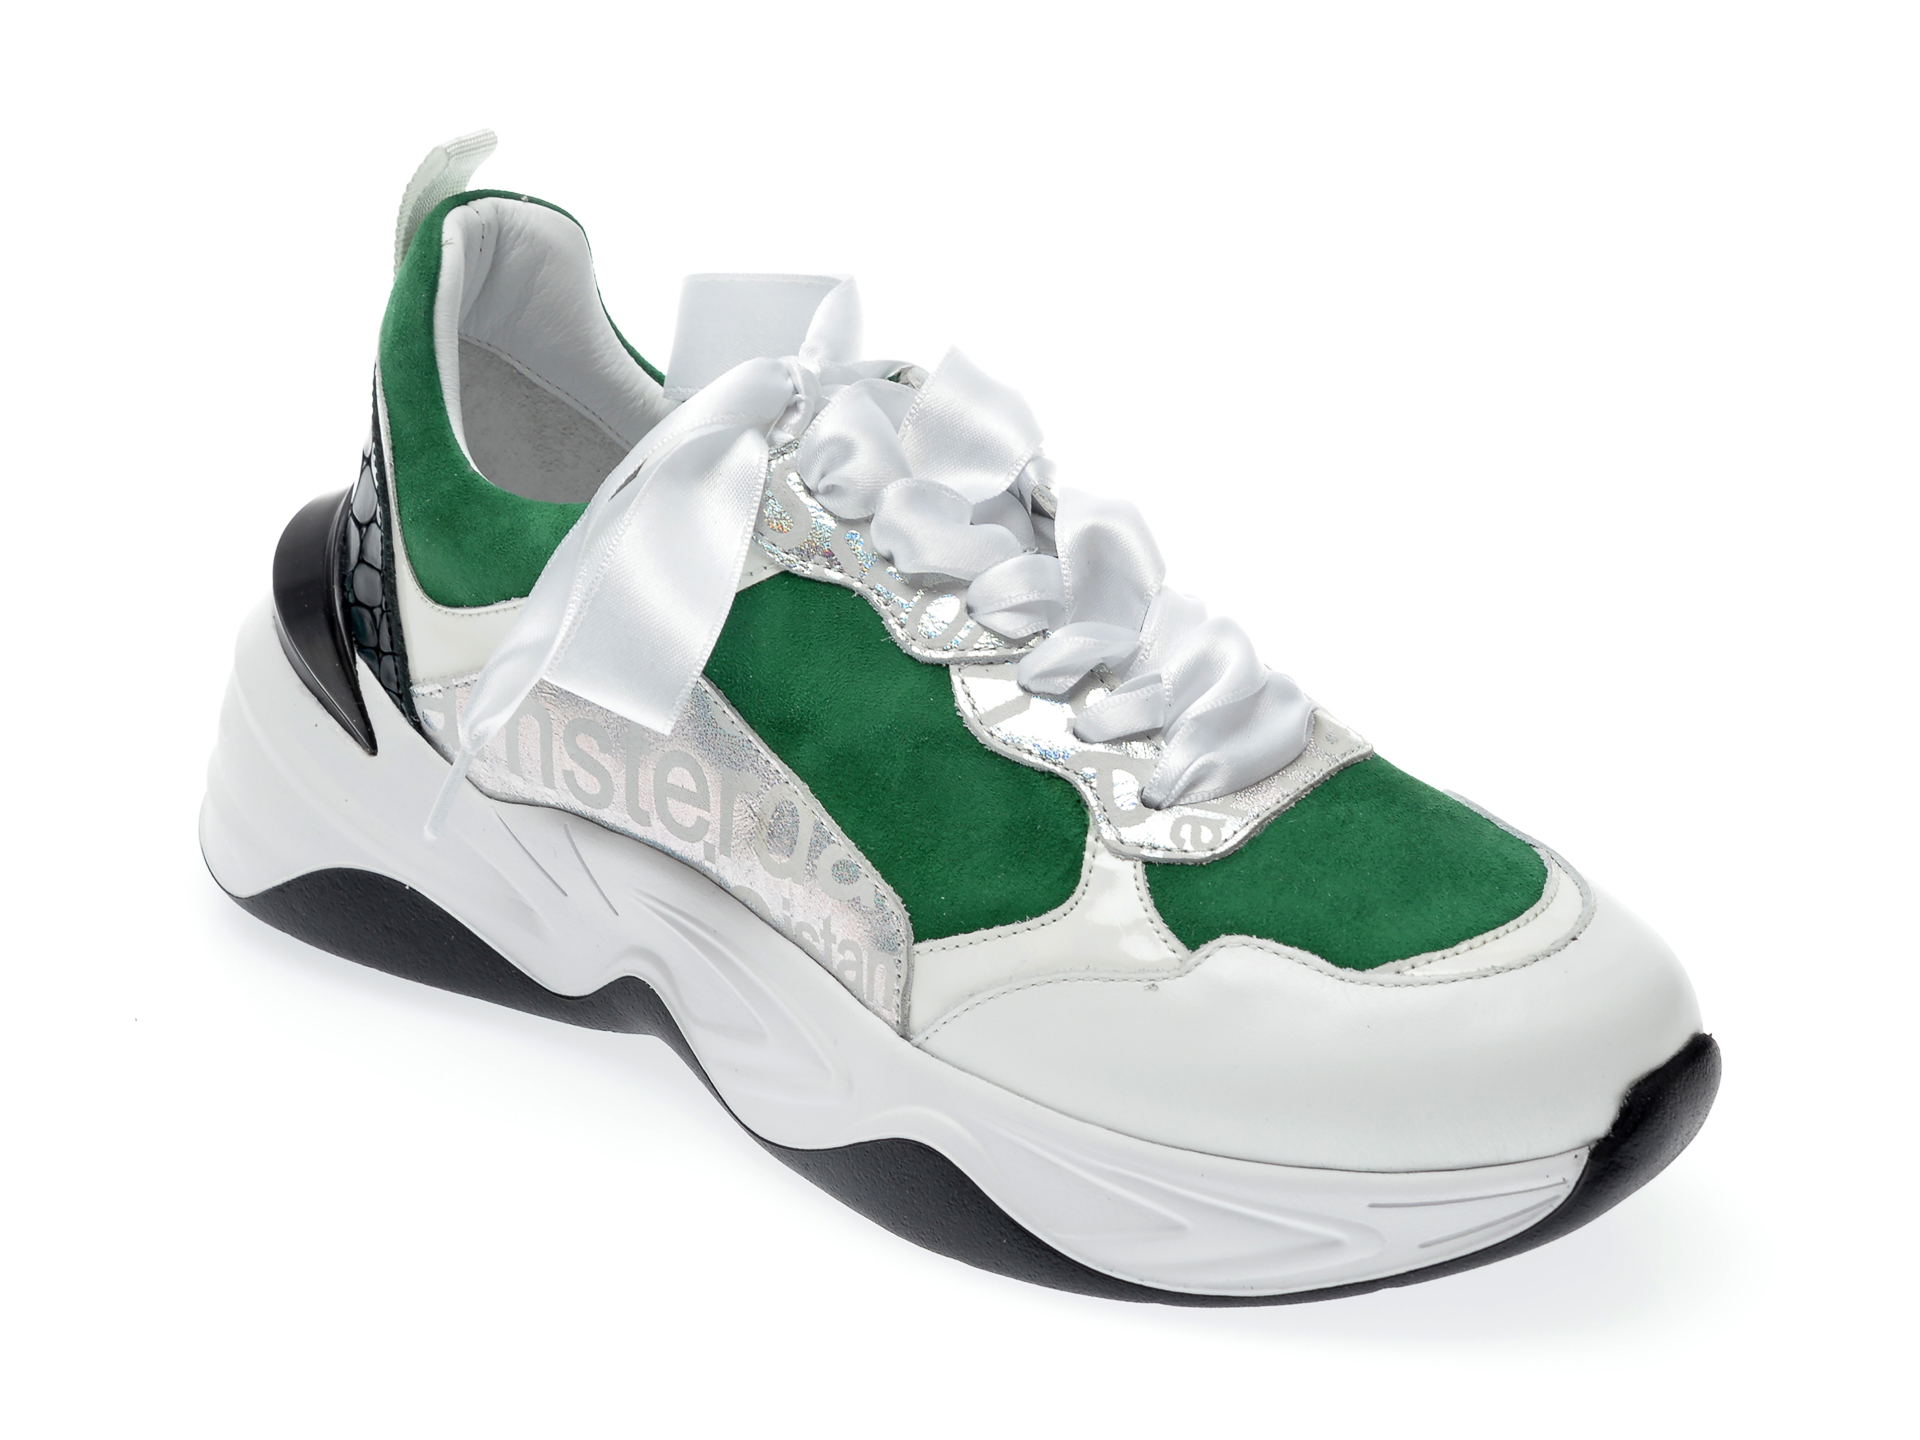 Pantofi sport EPICA albi, 135P205, din piele naturala New